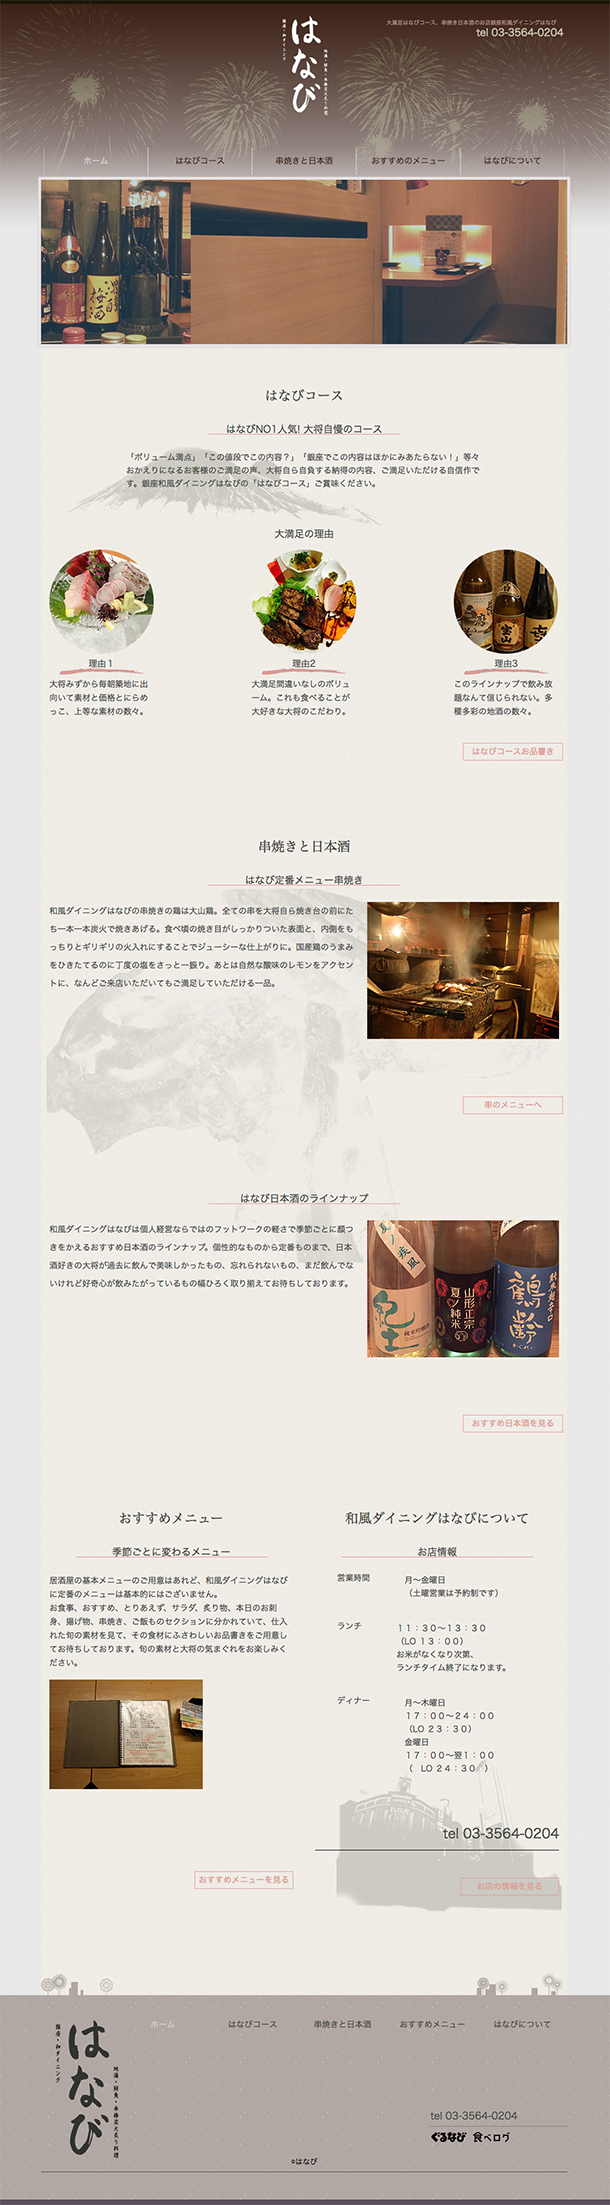 http://ginzahanabi.webcrow.jp/